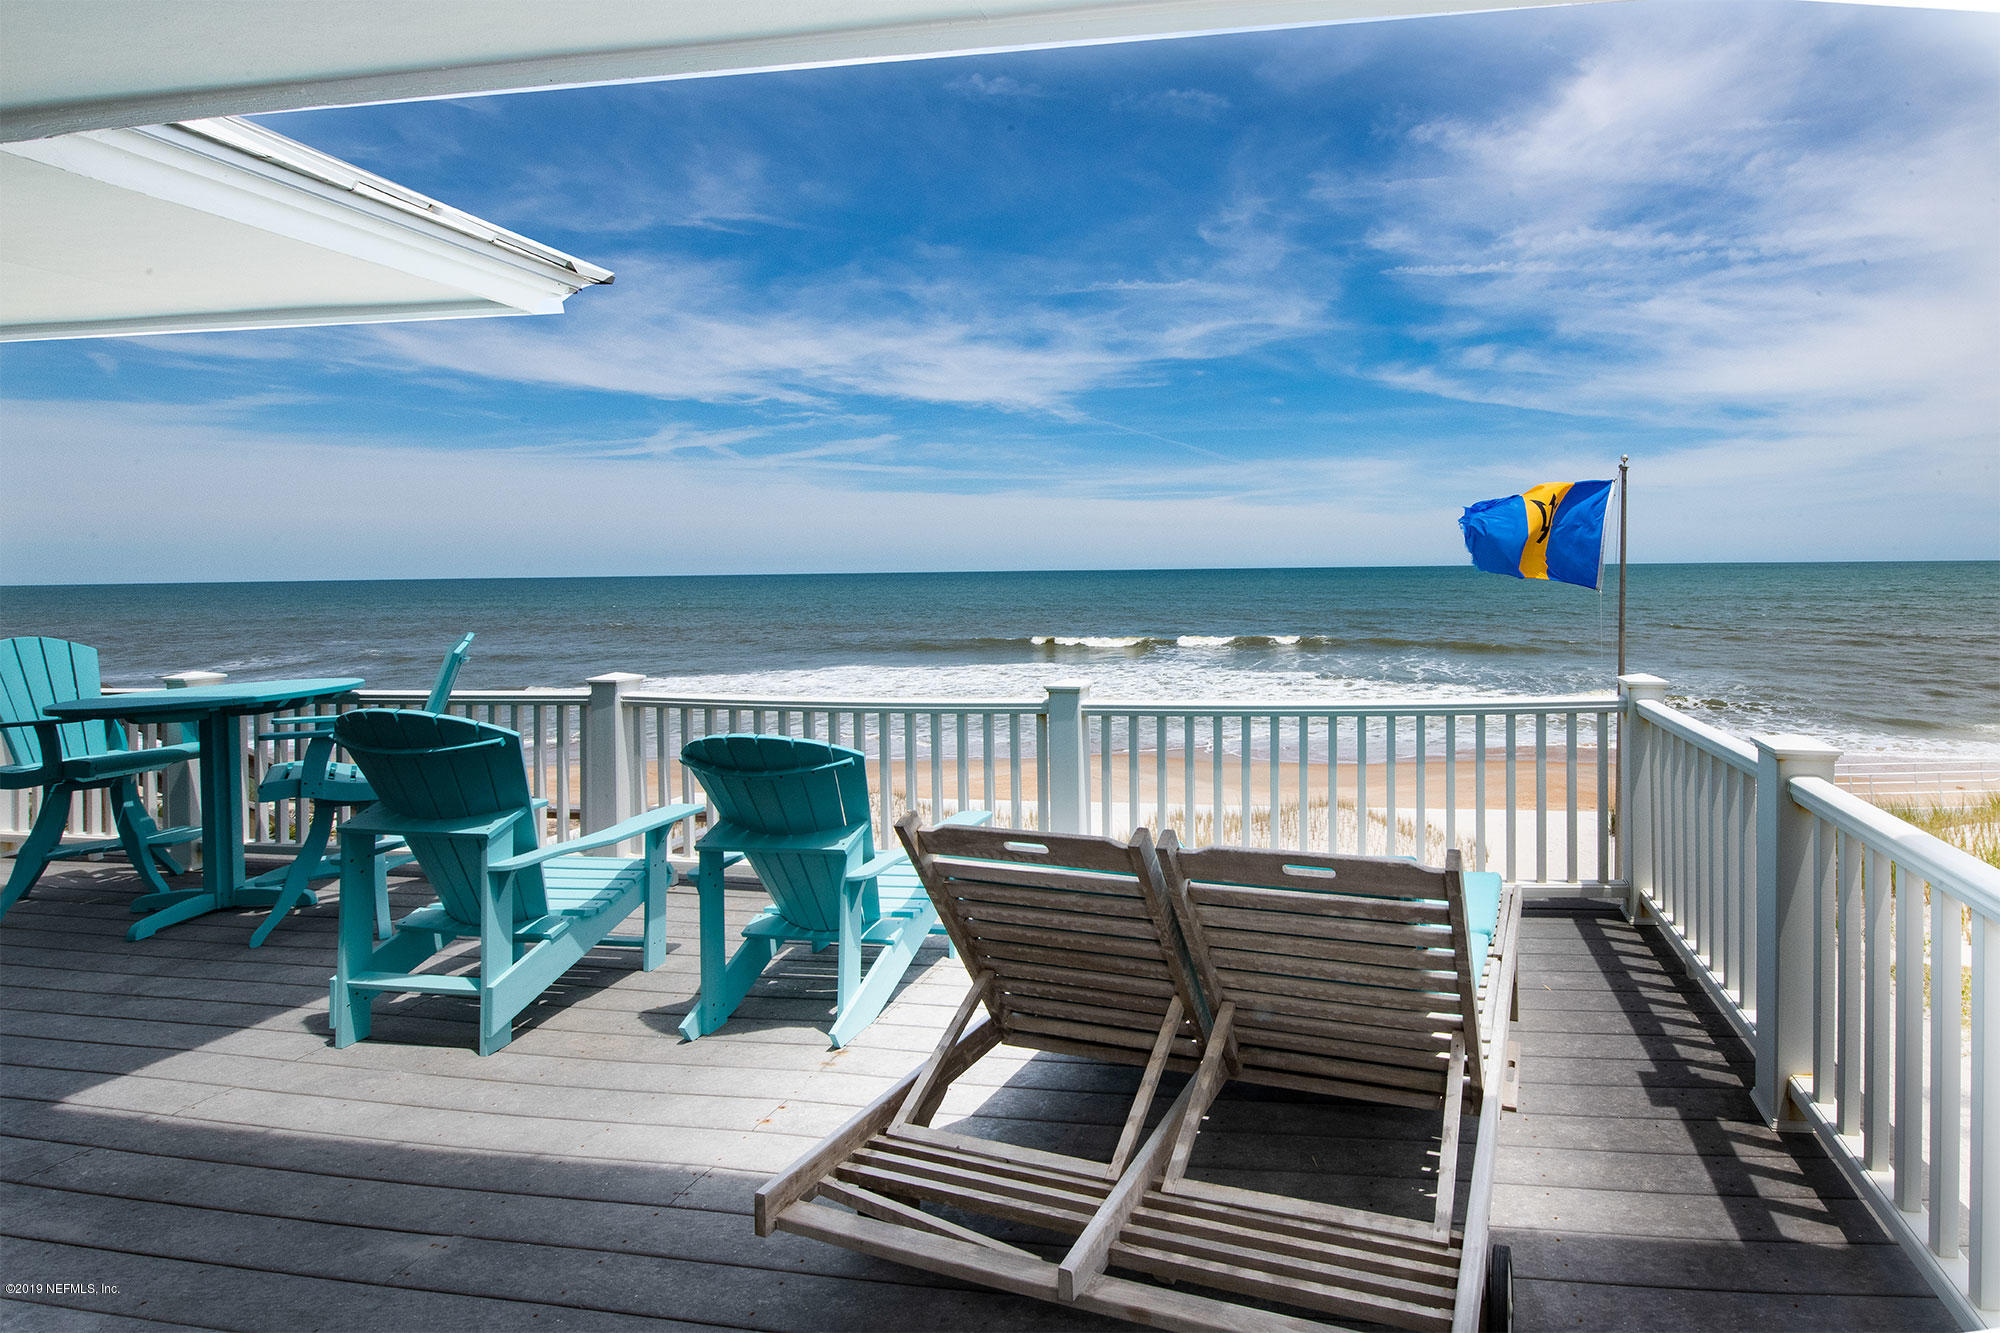 2903 PONTE VEDRA, PONTE VEDRA BEACH, FLORIDA 32082, 4 Bedrooms Bedrooms, ,3 BathroomsBathrooms,Residential,For sale,PONTE VEDRA,1077049